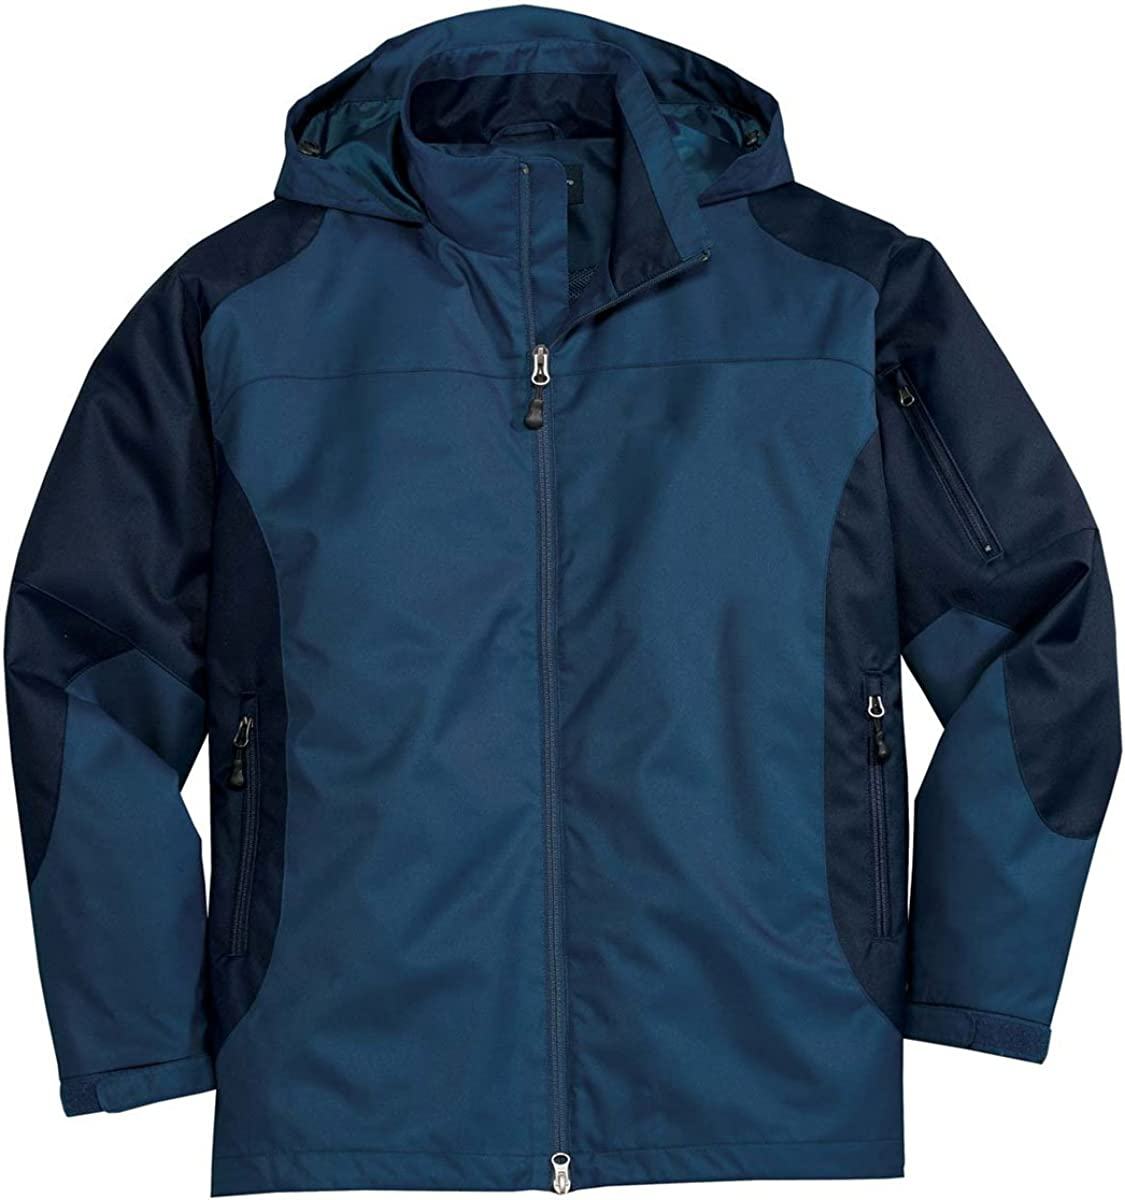 Port Authority Men's Fashion Endeavor Hooded Jacket